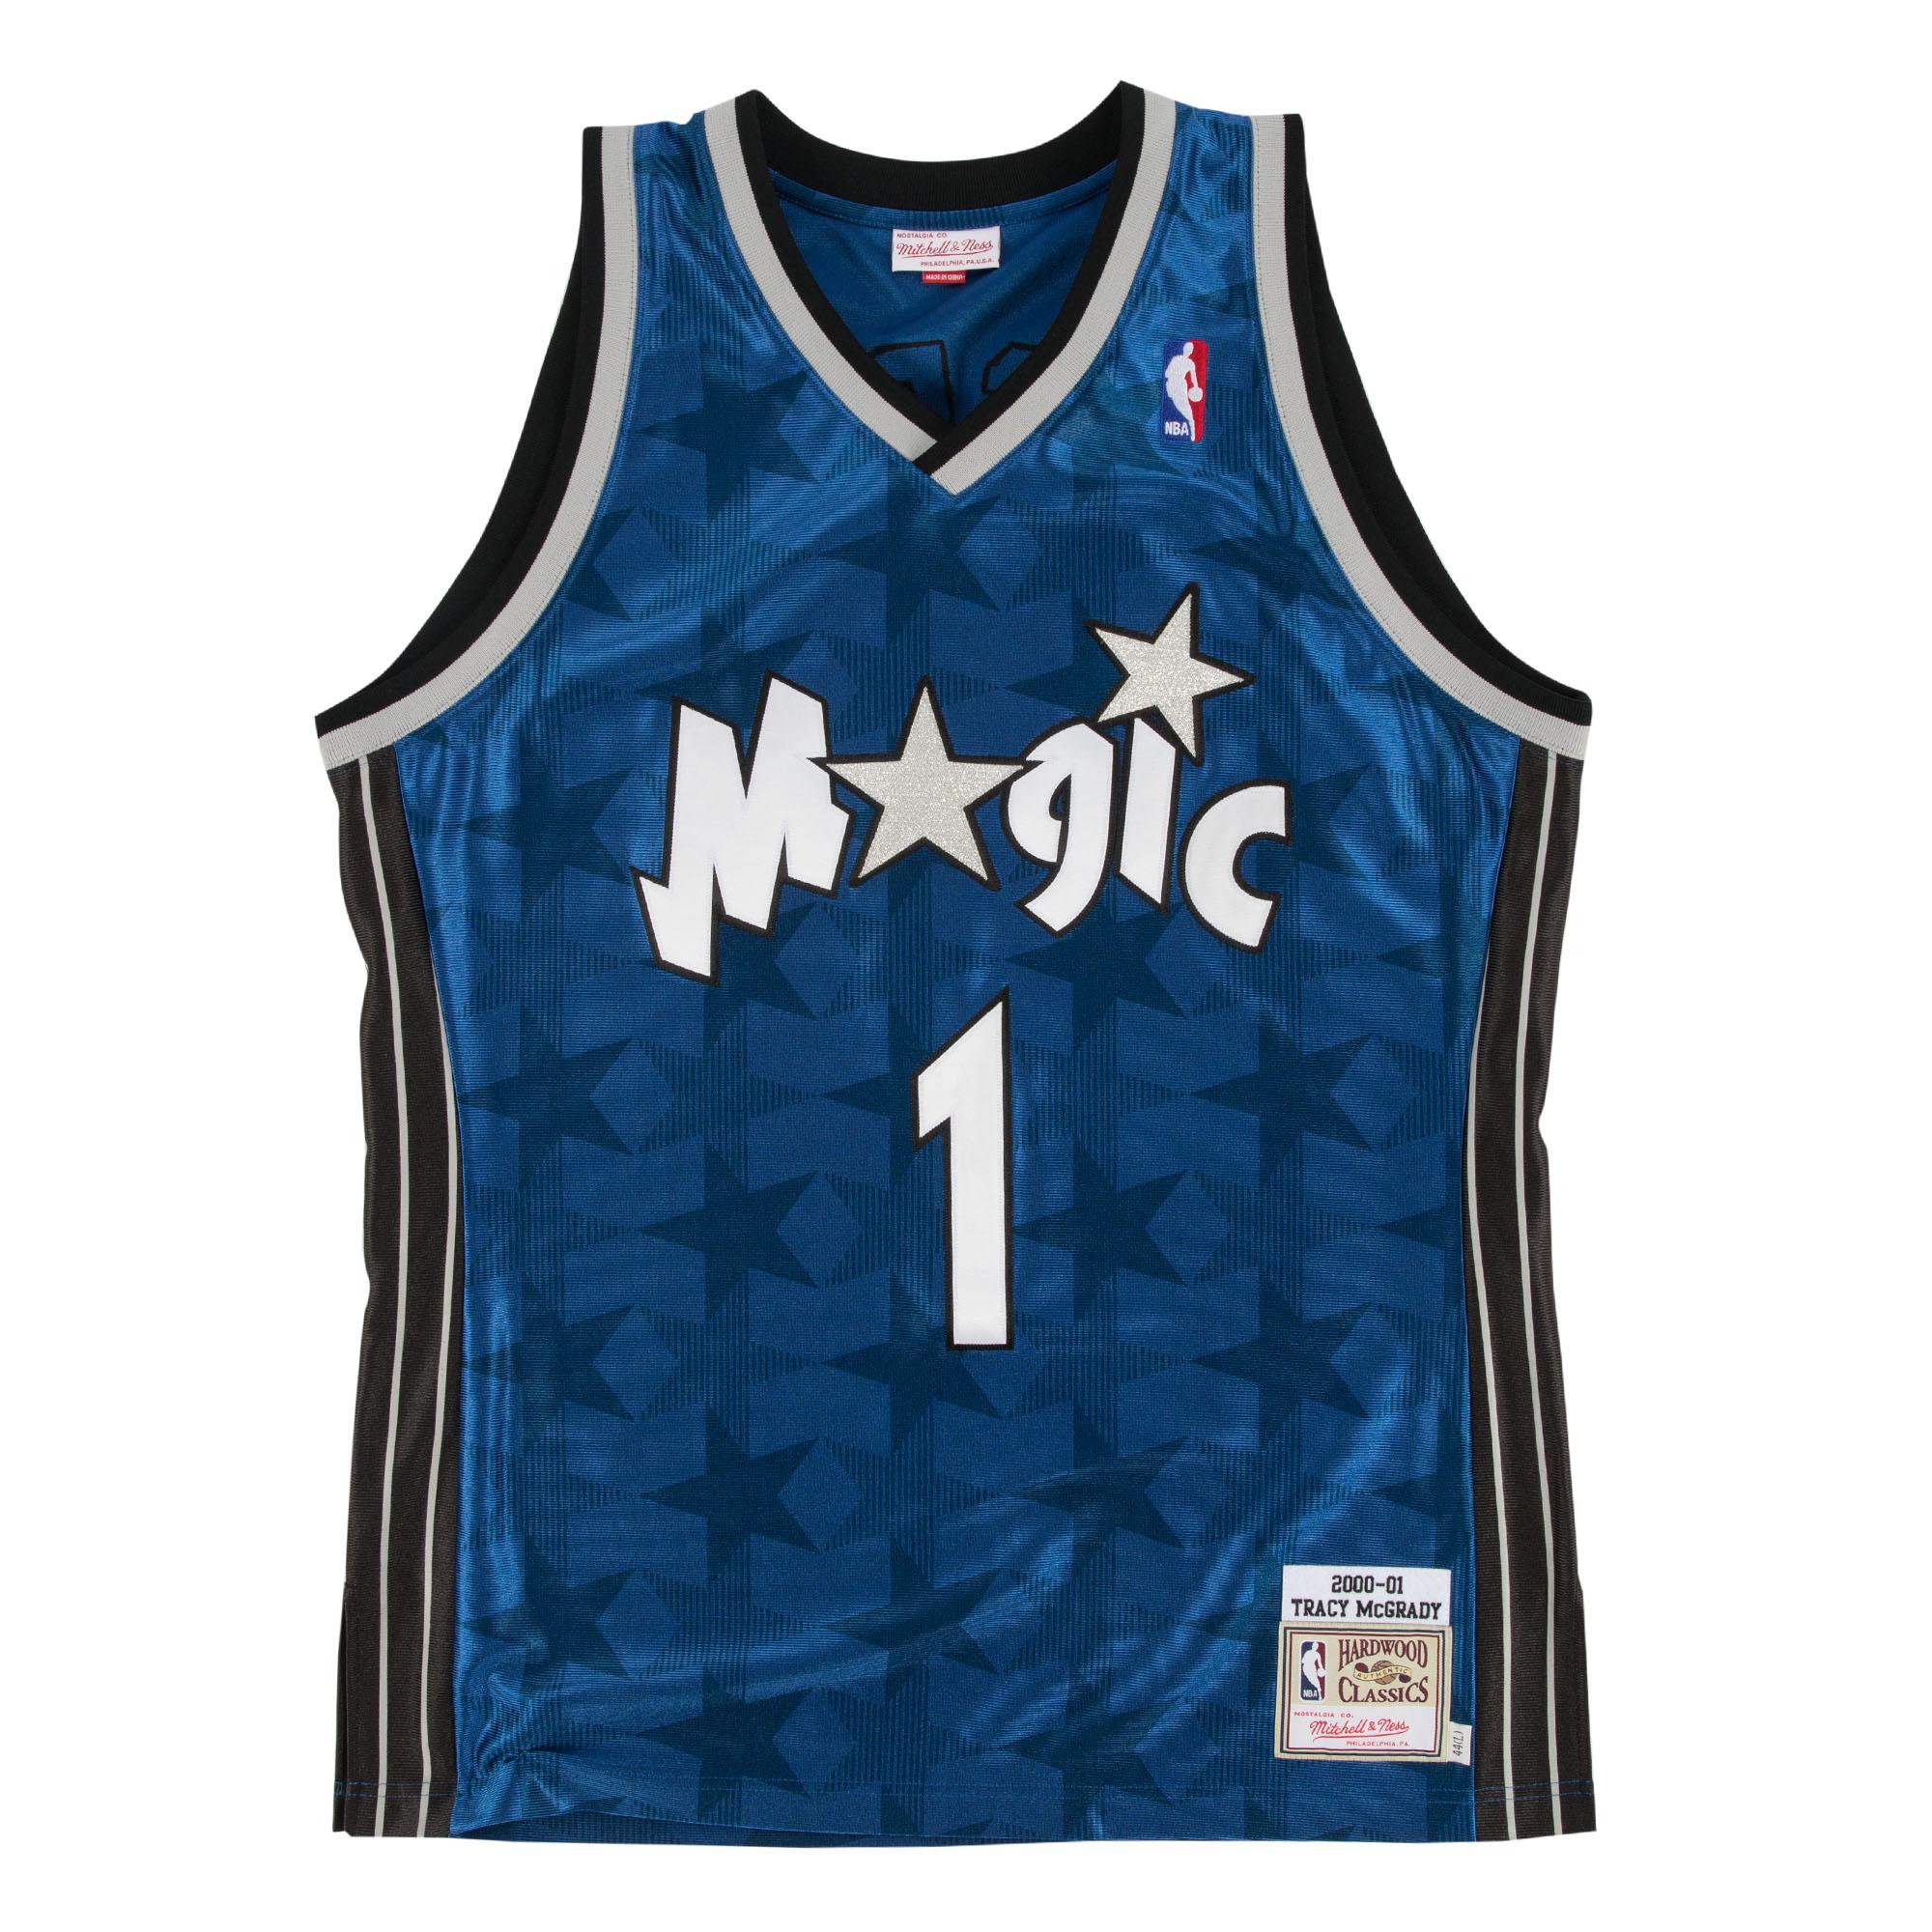 5598d06e372 ... where can i buy tracy mcgrady authentic jersey 2000 01 orlando magic  ad279 655b2